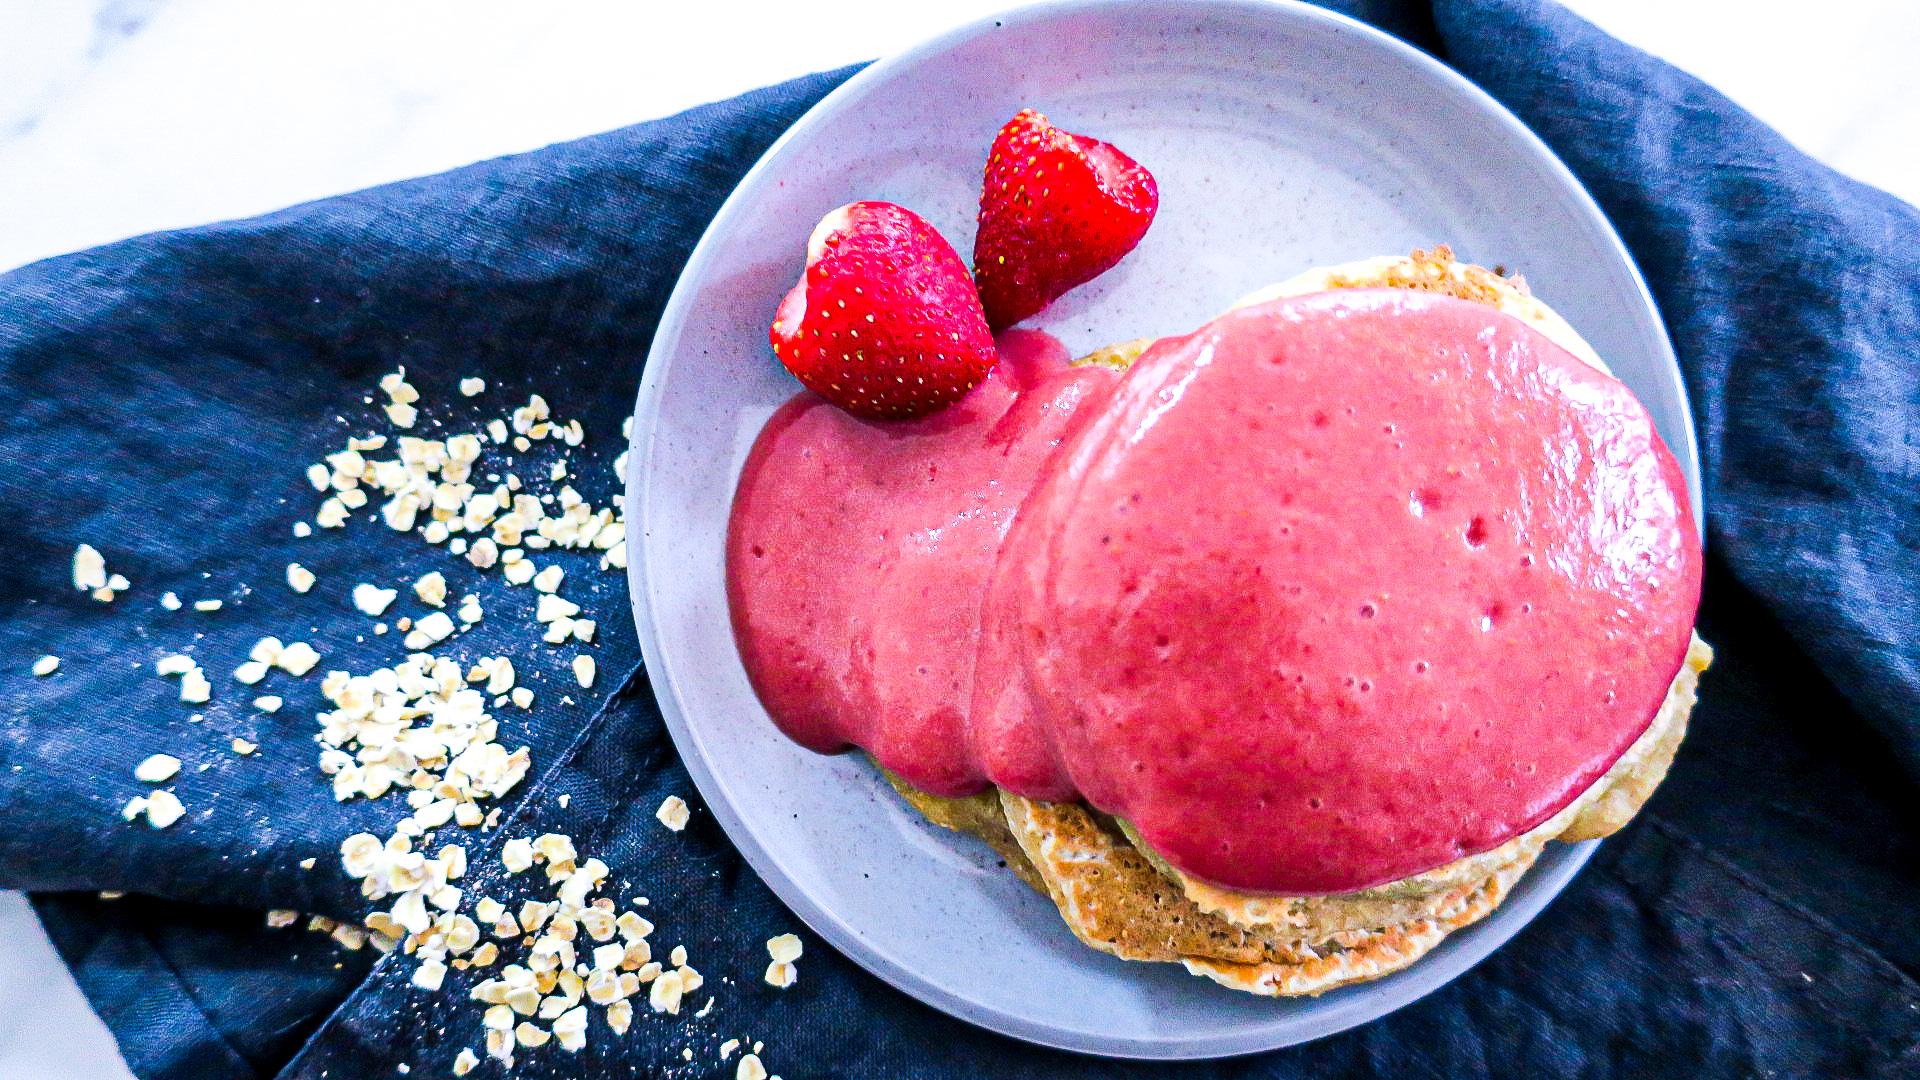 Vegane Bananen Pancakes mit super gesunder Erdbeersauce #pancakes #gesund #healthy #vegan #recipe #erdbeersoße #rezept #recipe